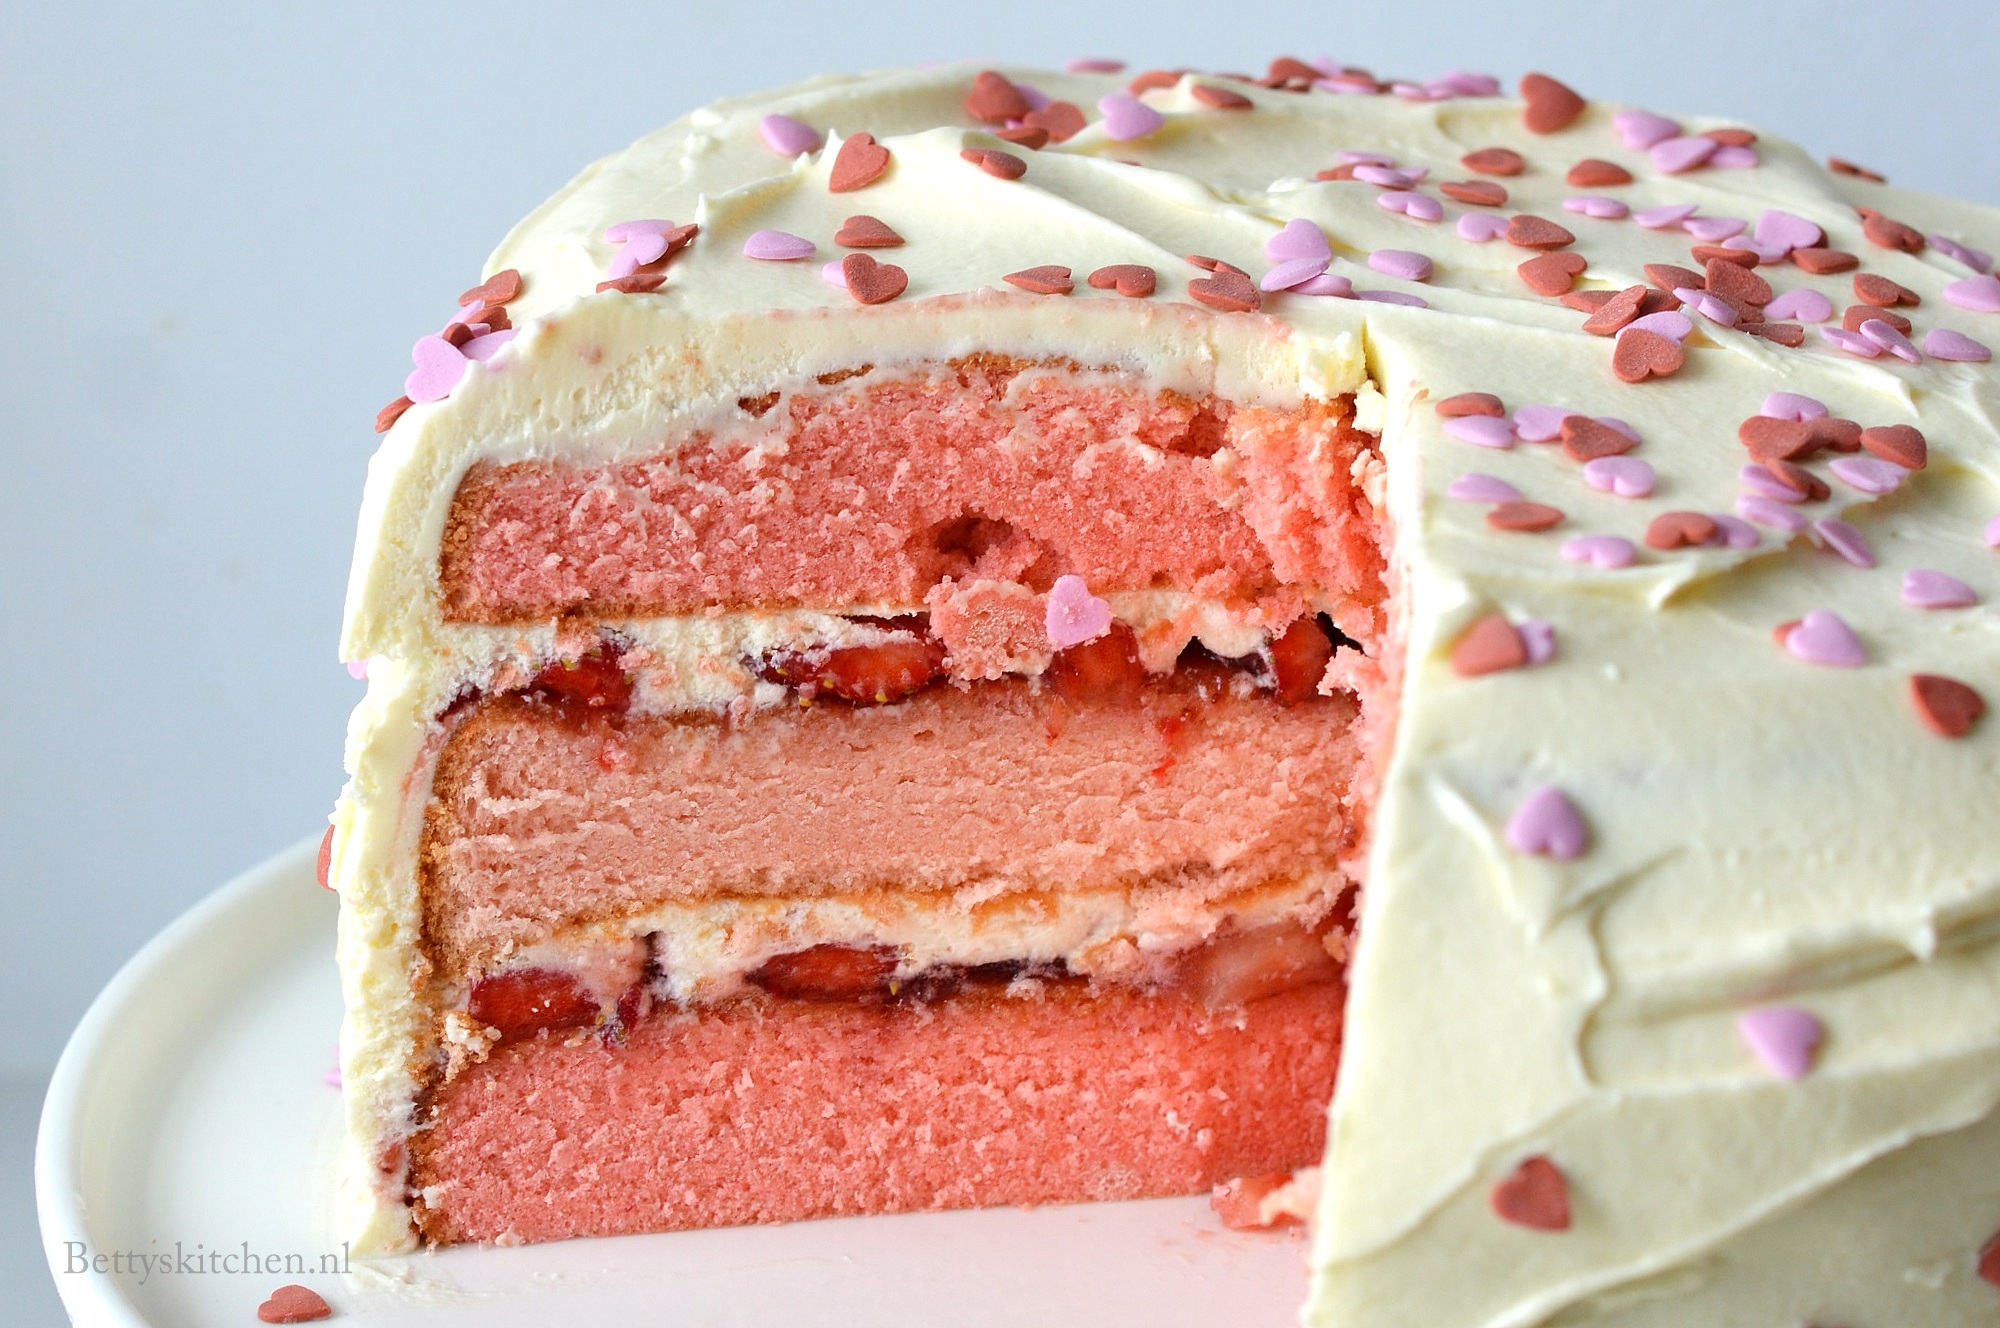 Kraamtaart met aardbeien (voor geboorte meisje)